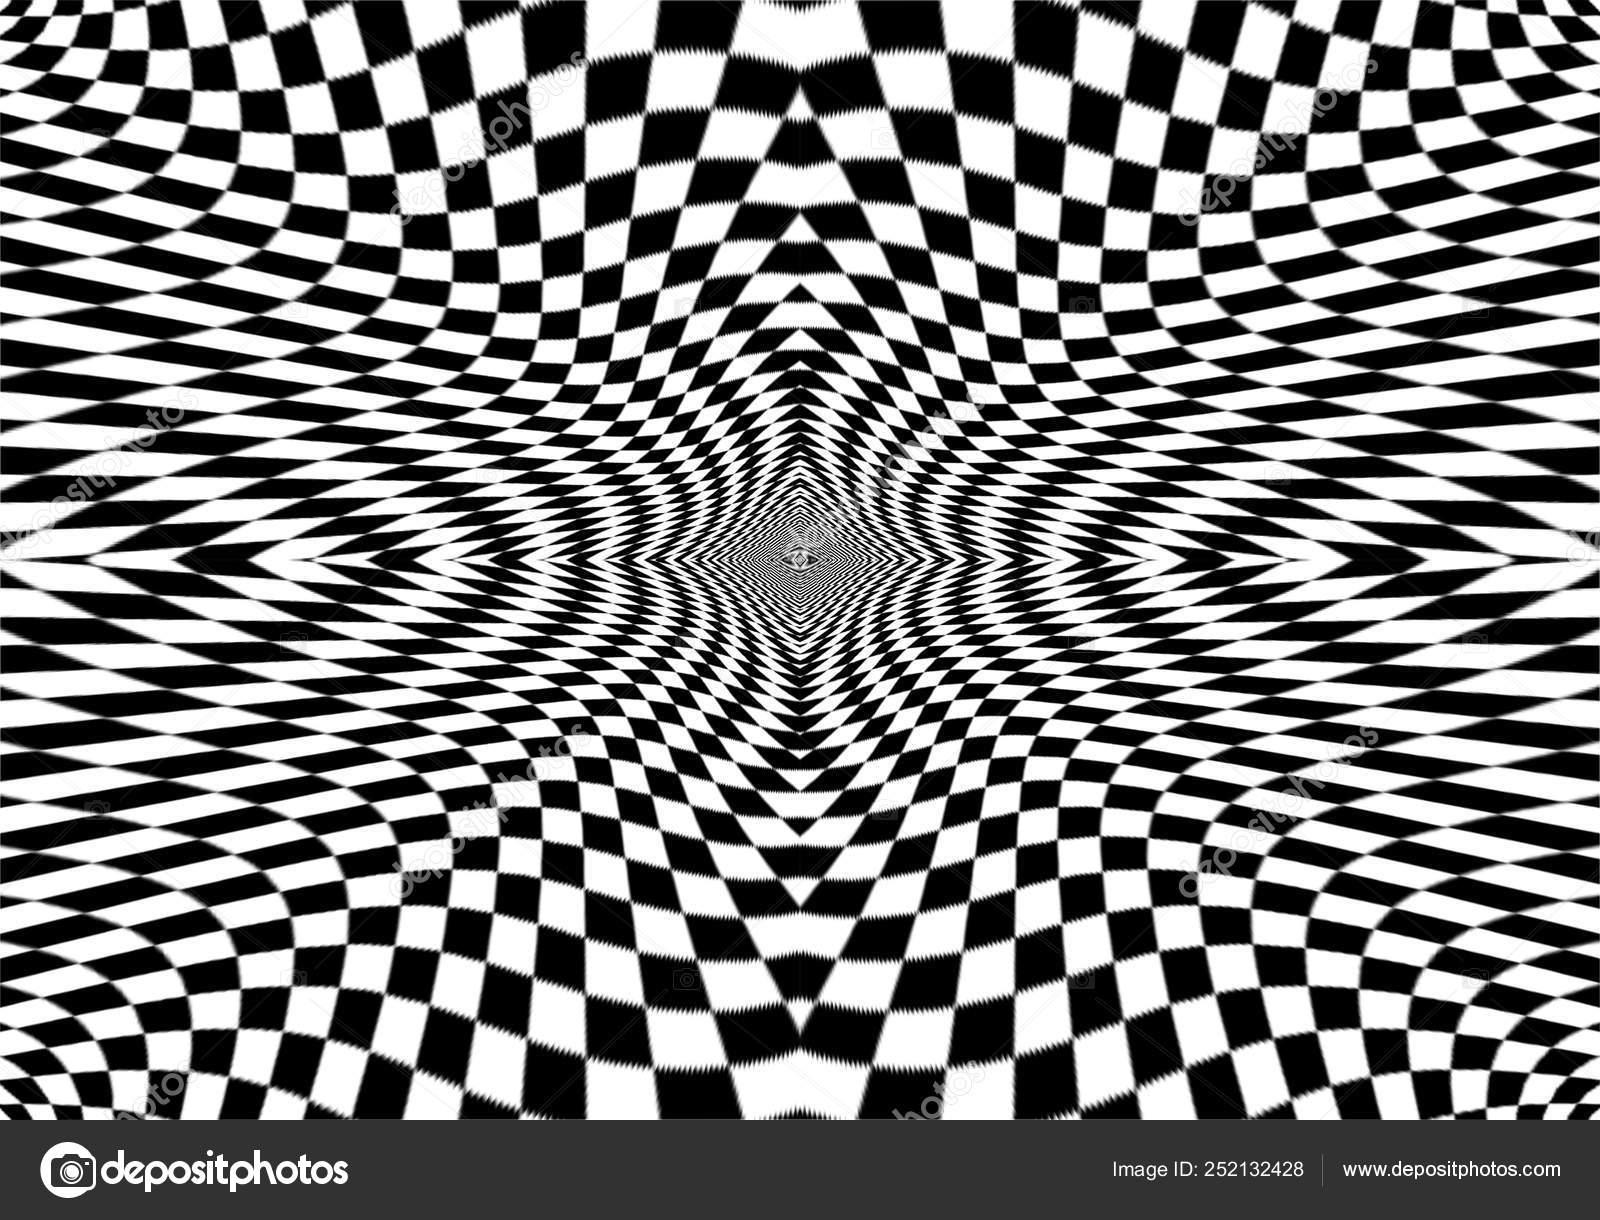 depositphotos 252132428 stock photo hypnotic optical illusion in black